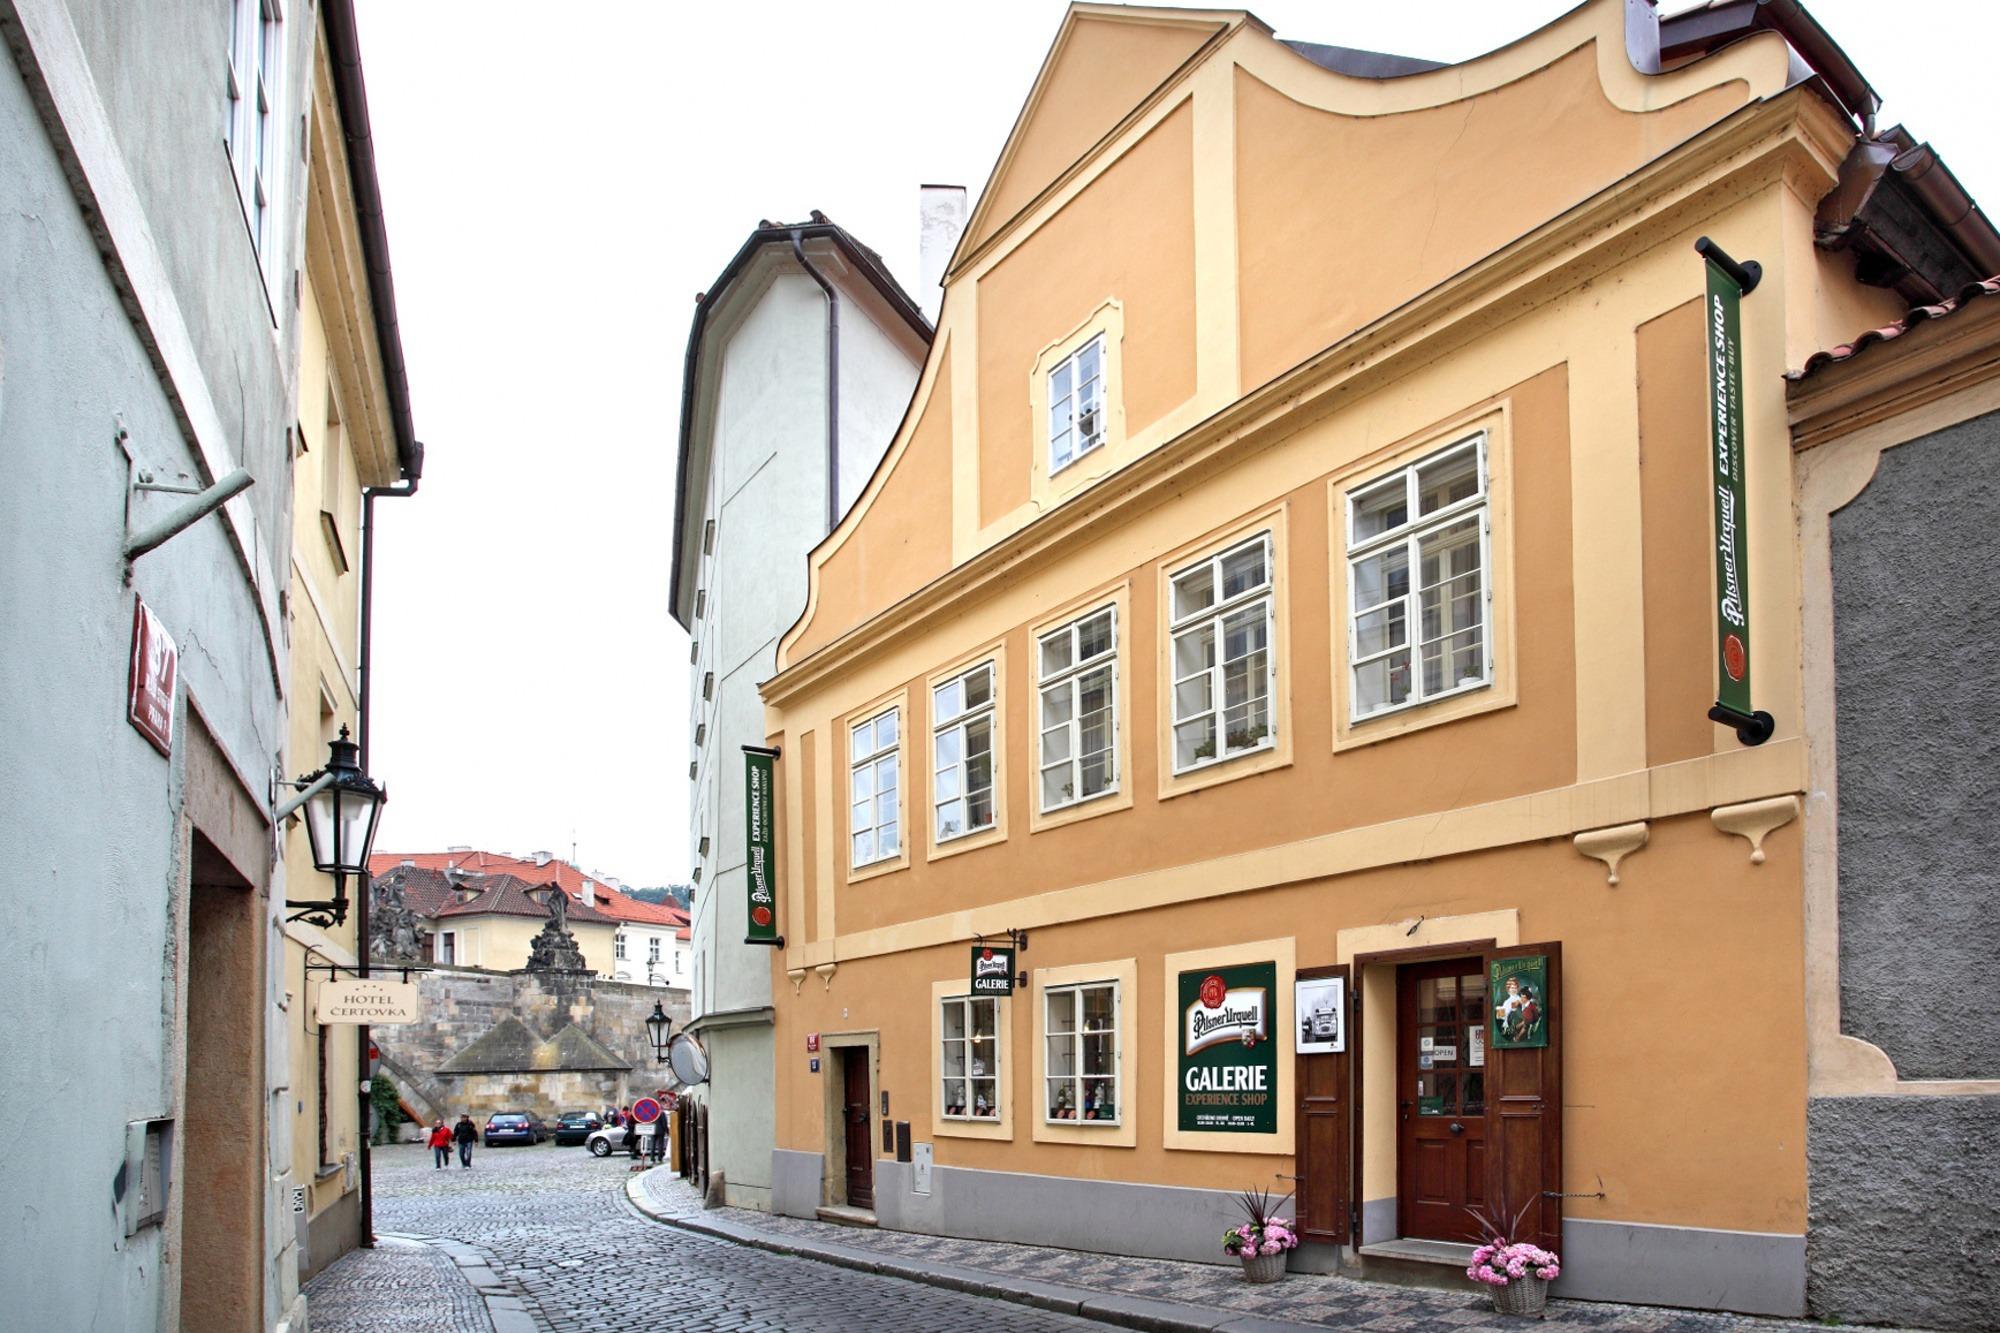 Pilsner Urquell Kampa Gallery